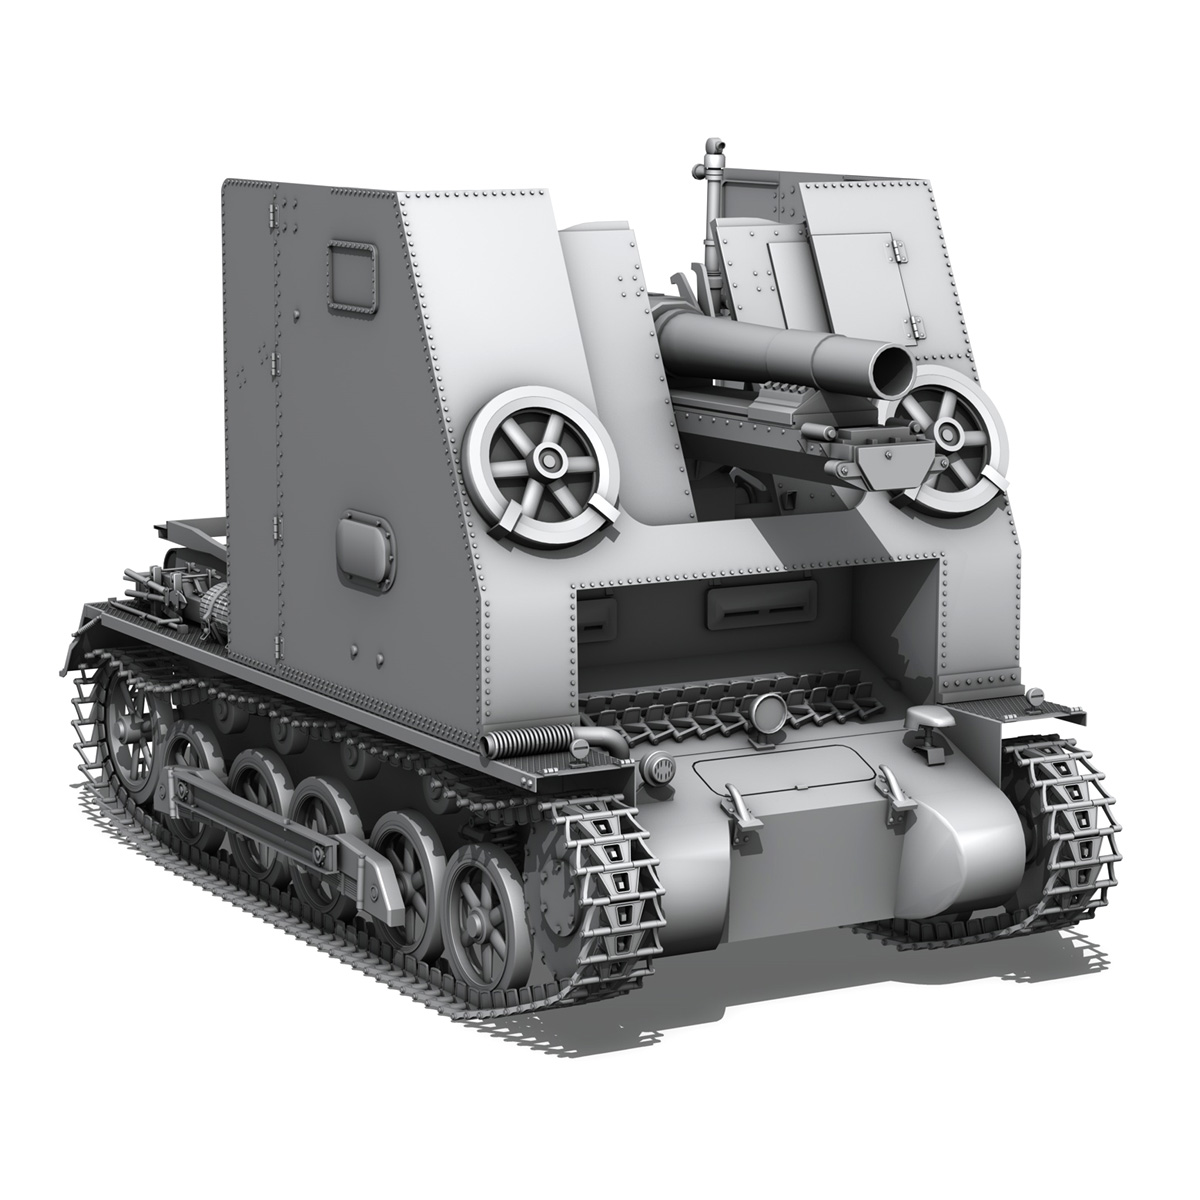 sd.kfz 101 – sturmpanzer 1 – bison 3d model 3ds fbx c4d lwo obj 189275